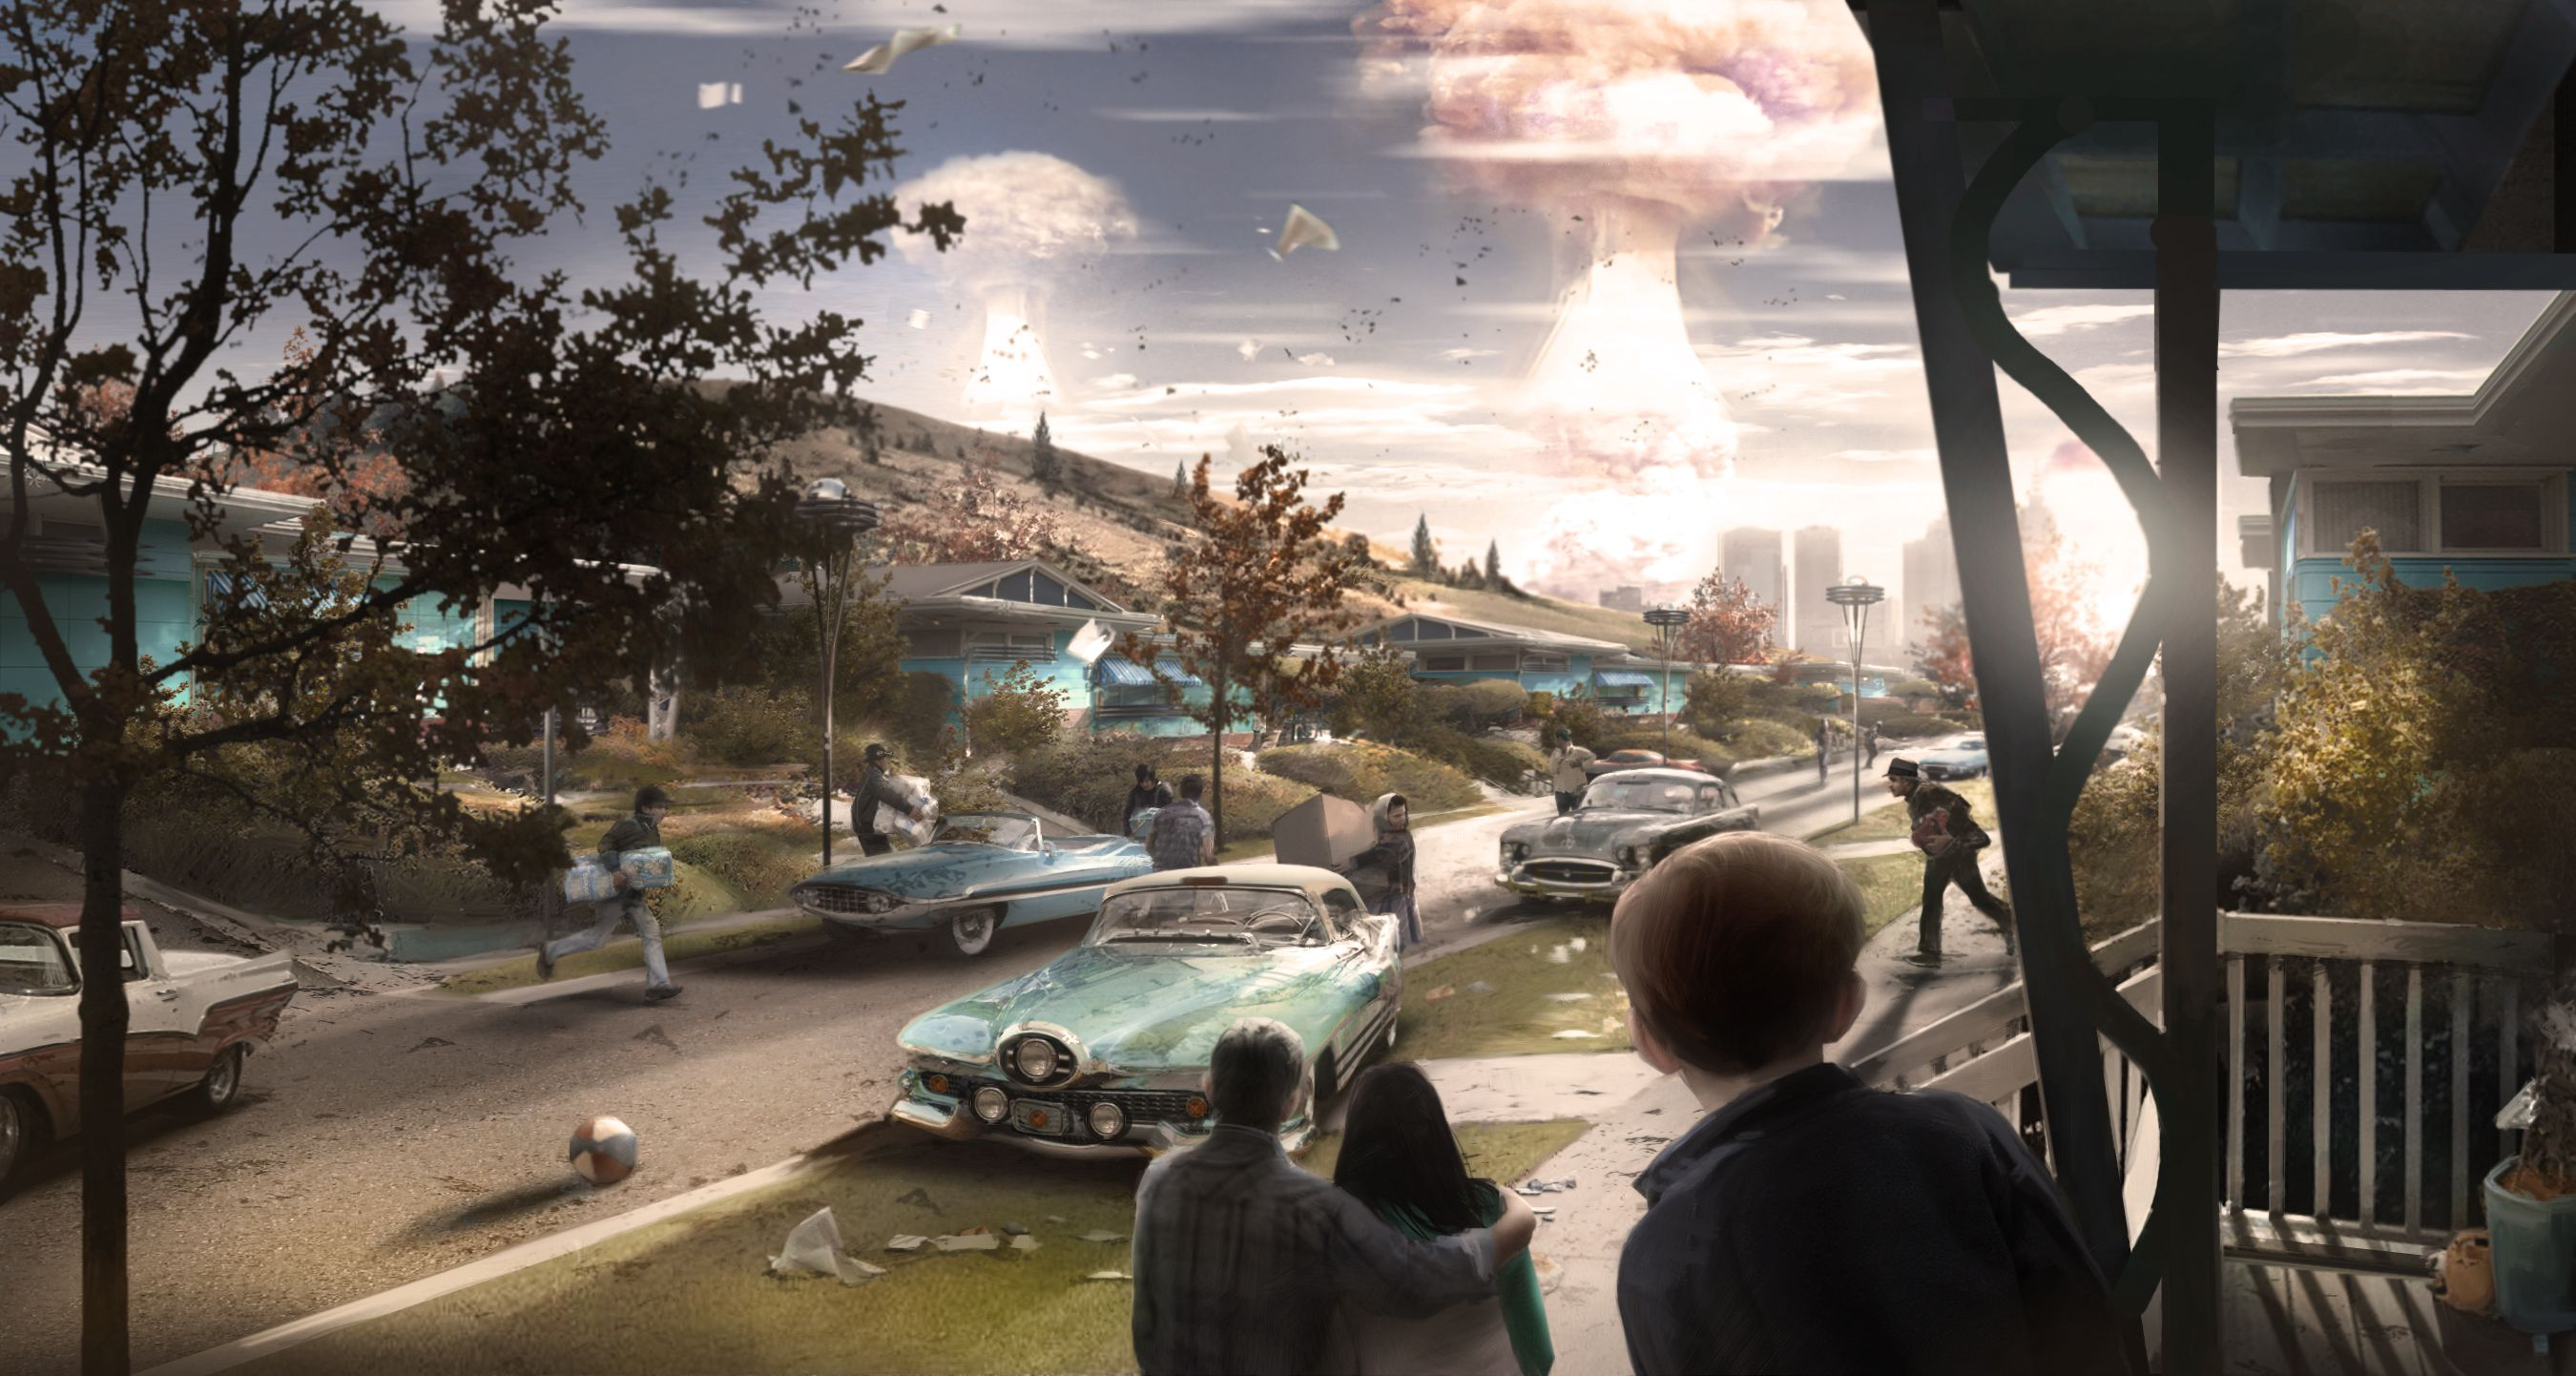 Fallout4_Concept_Blast_1434323459.0.jpg